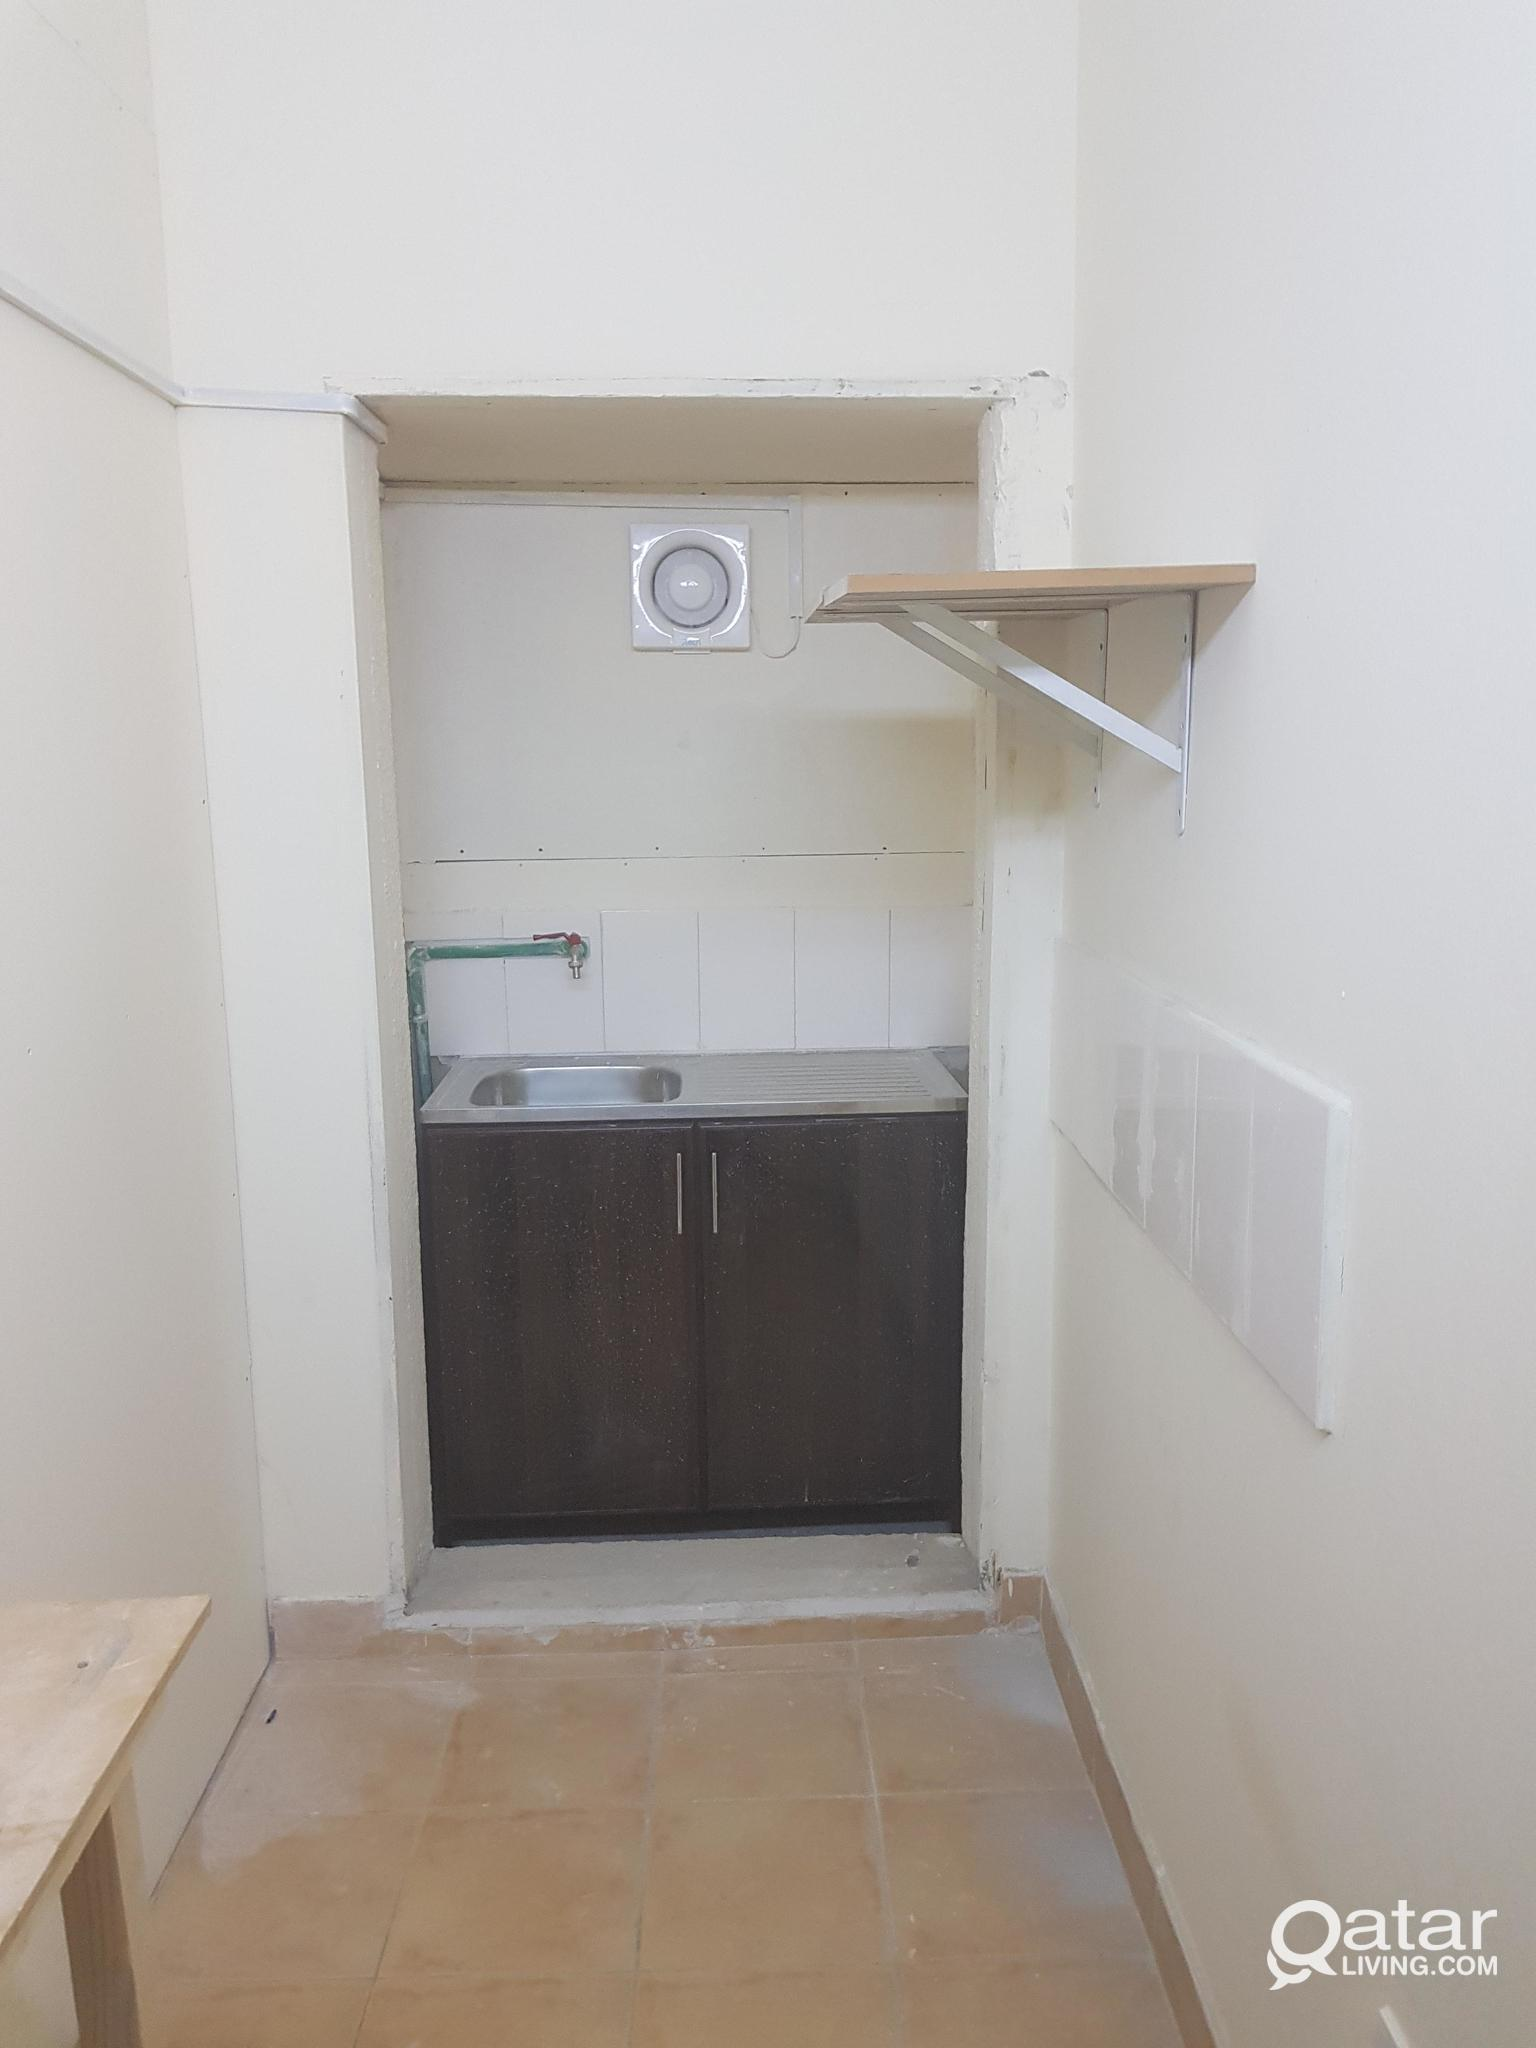 Studio type  Executive bachelor room rent nuija h